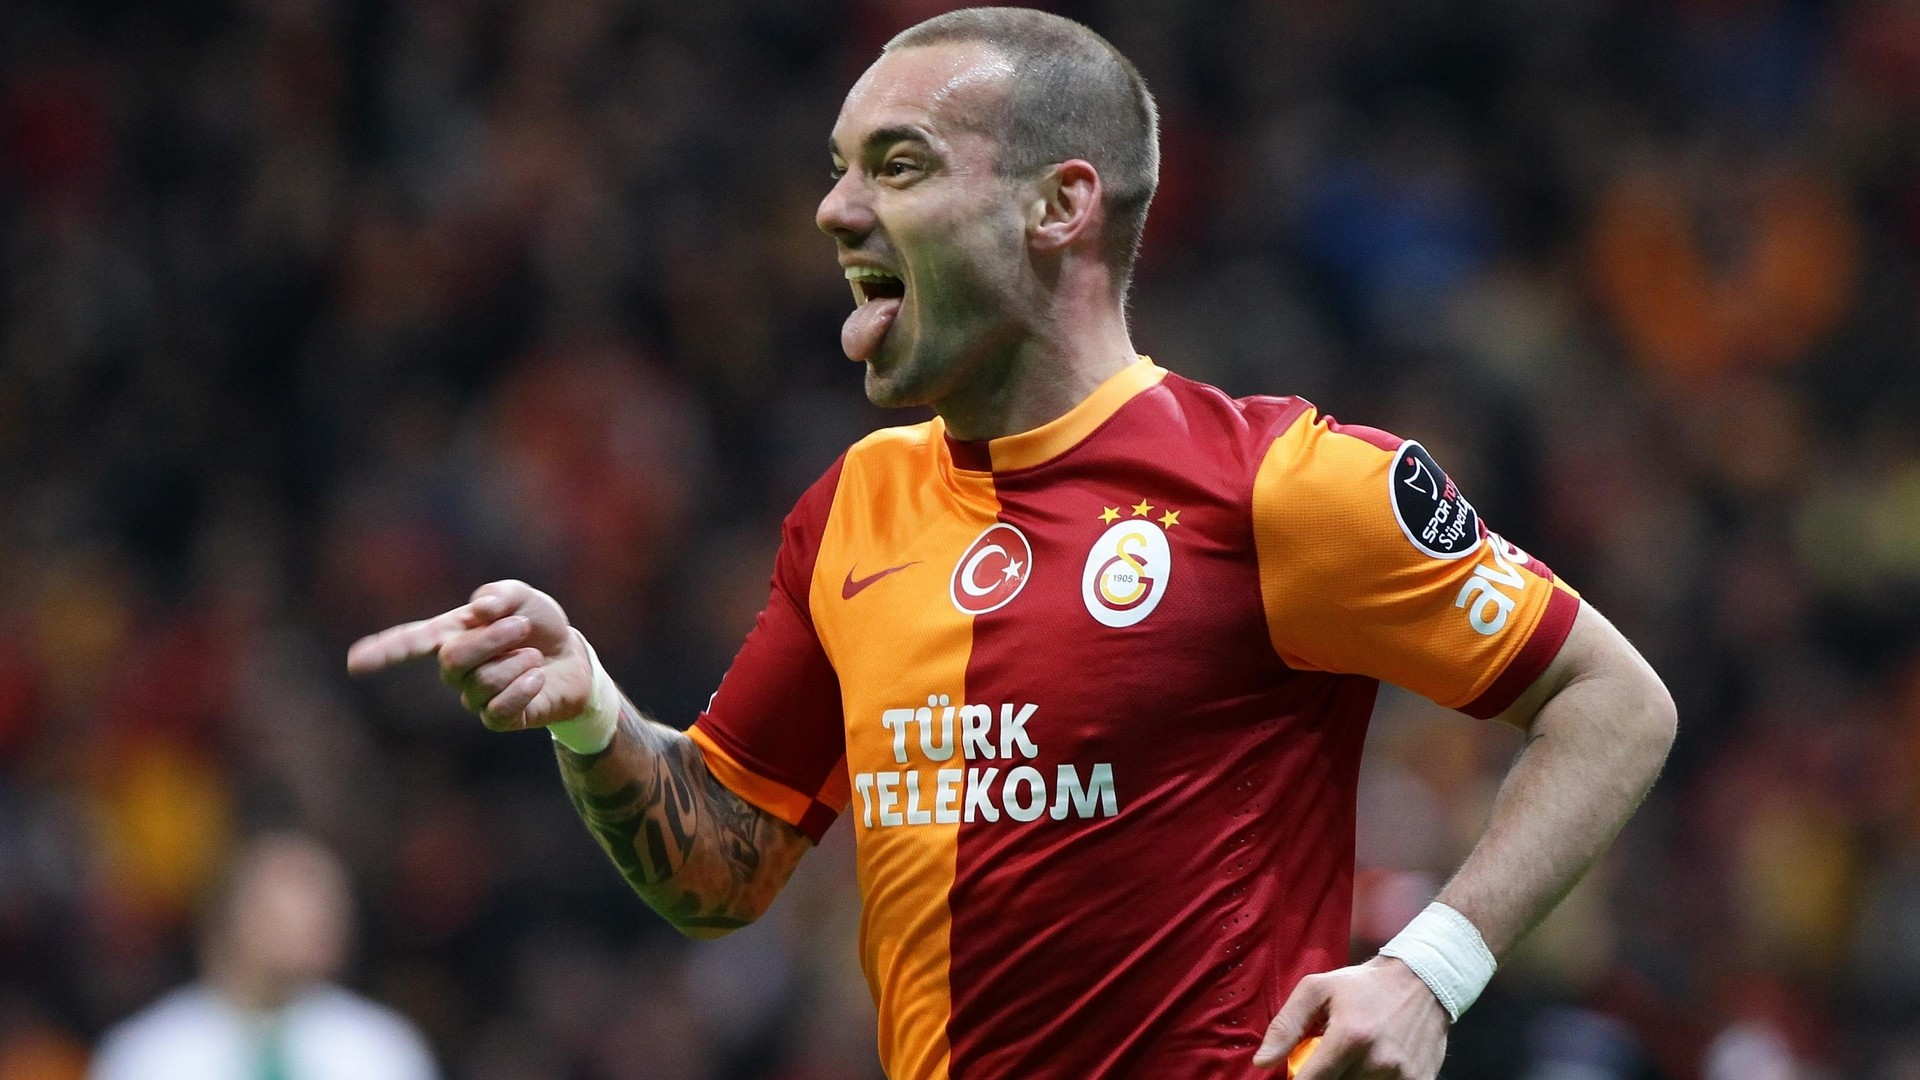 wesley-sneijder-galatasaray-cin-transferi